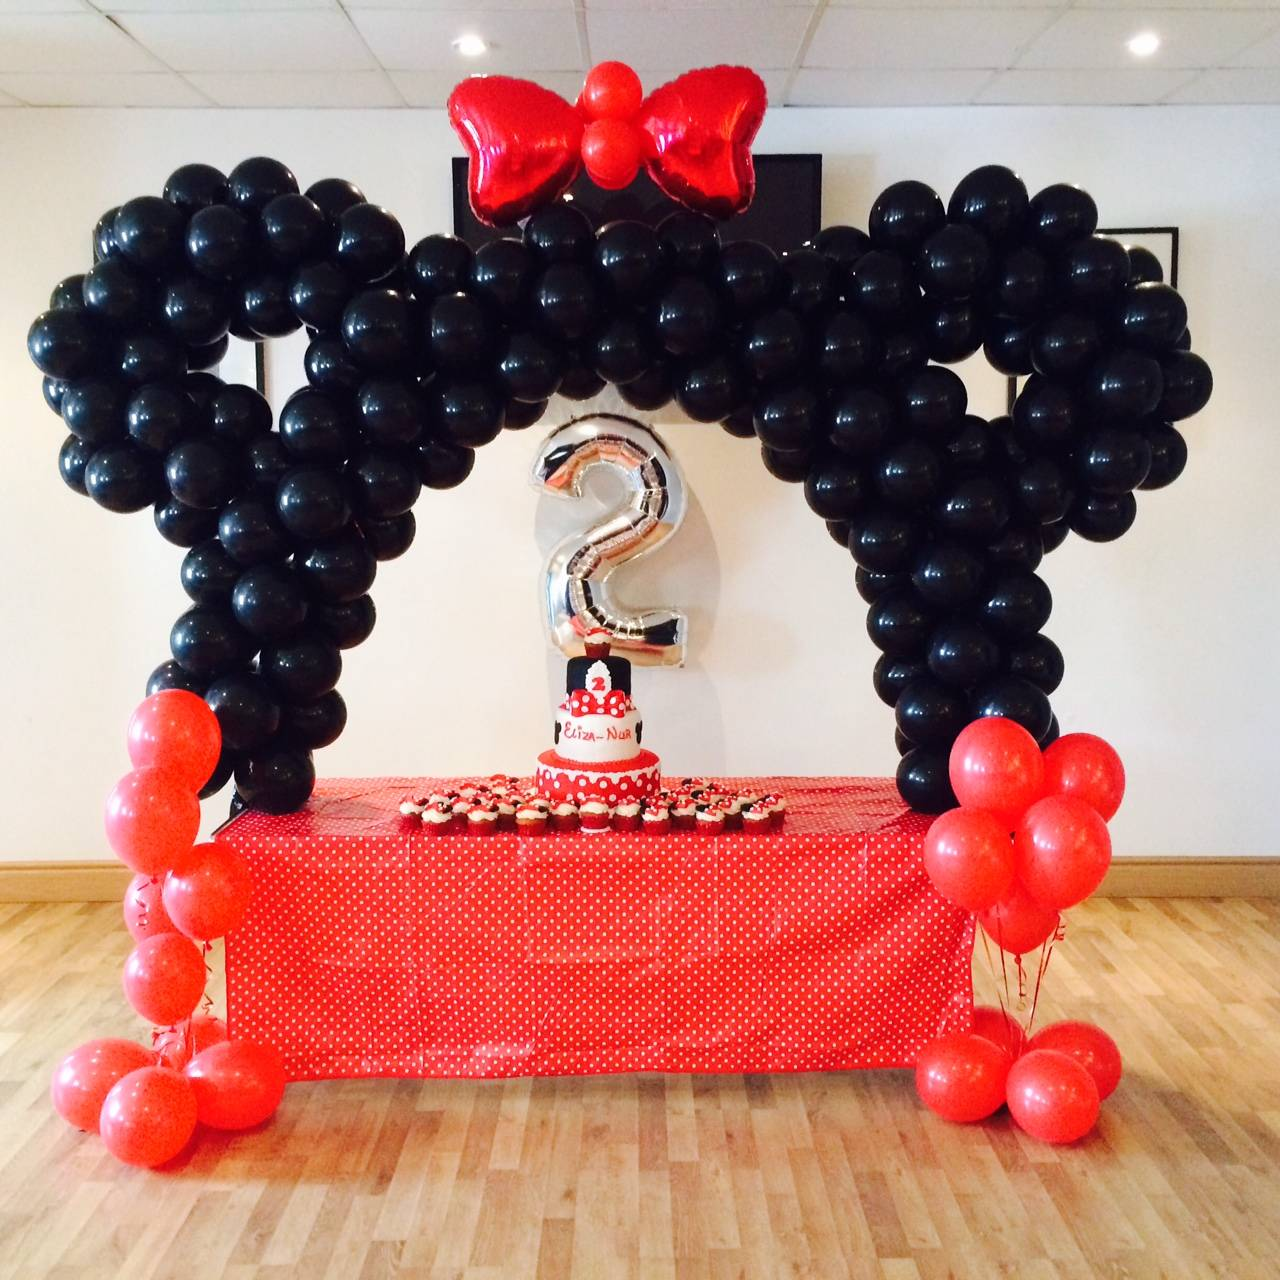 Balloon Decoration Packages , Brilliant Birthdays